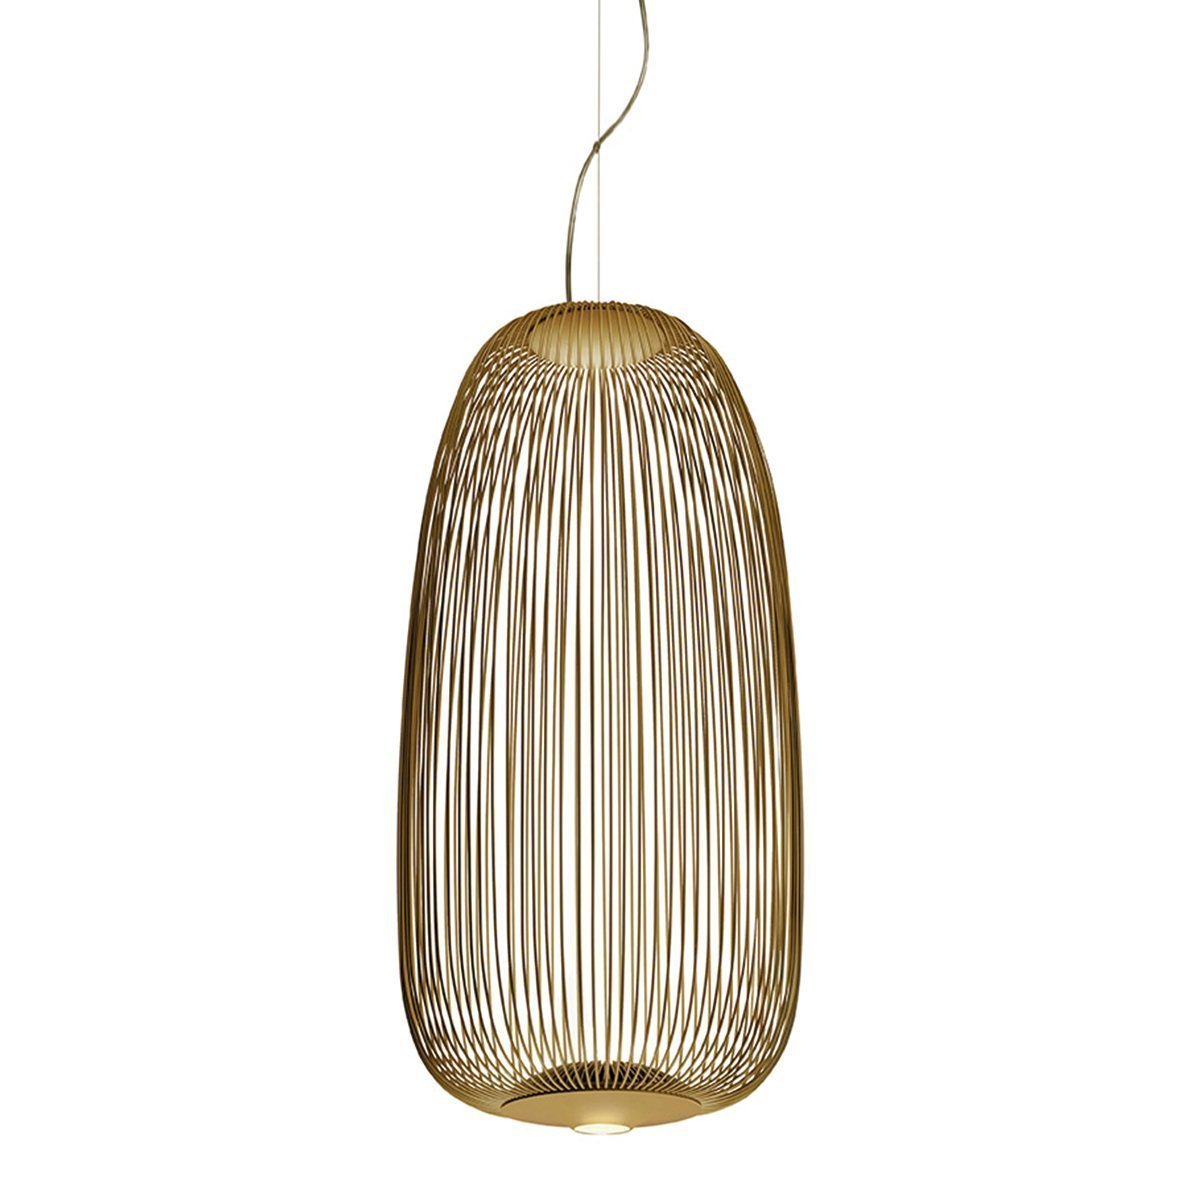 Foscarini Spokes 1 Hanglamp - Goud